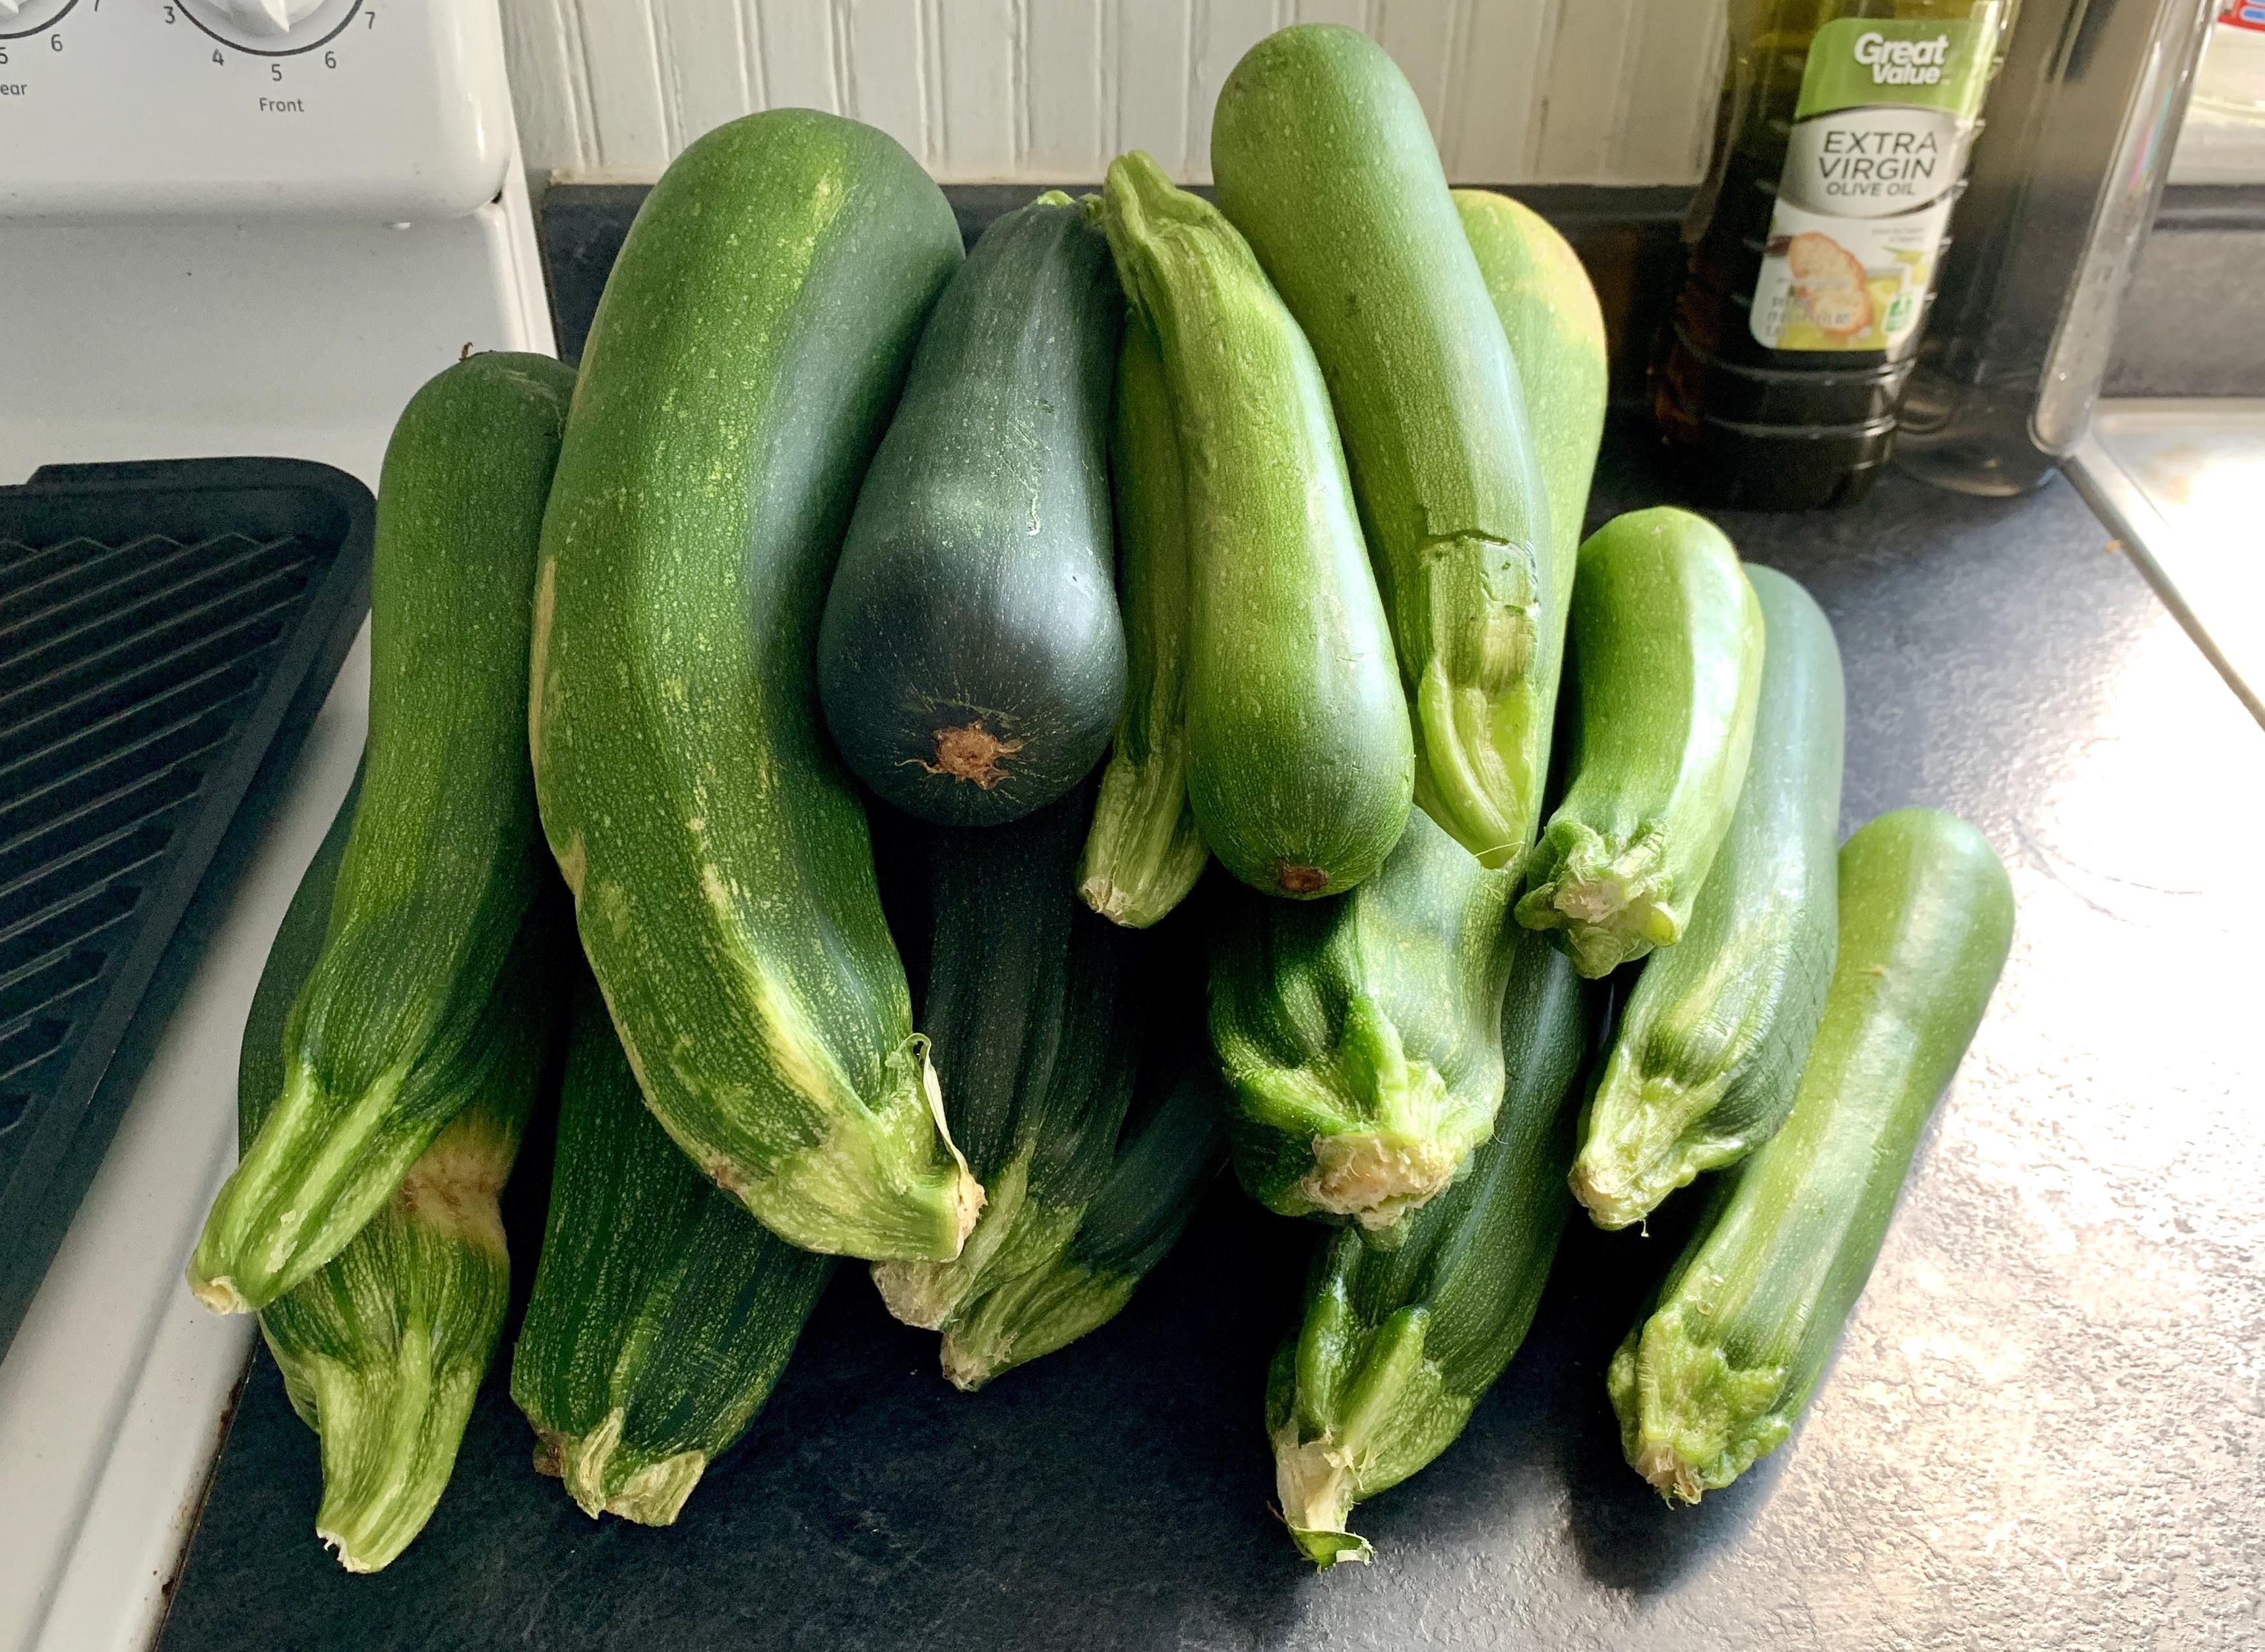 Zucchini bounty